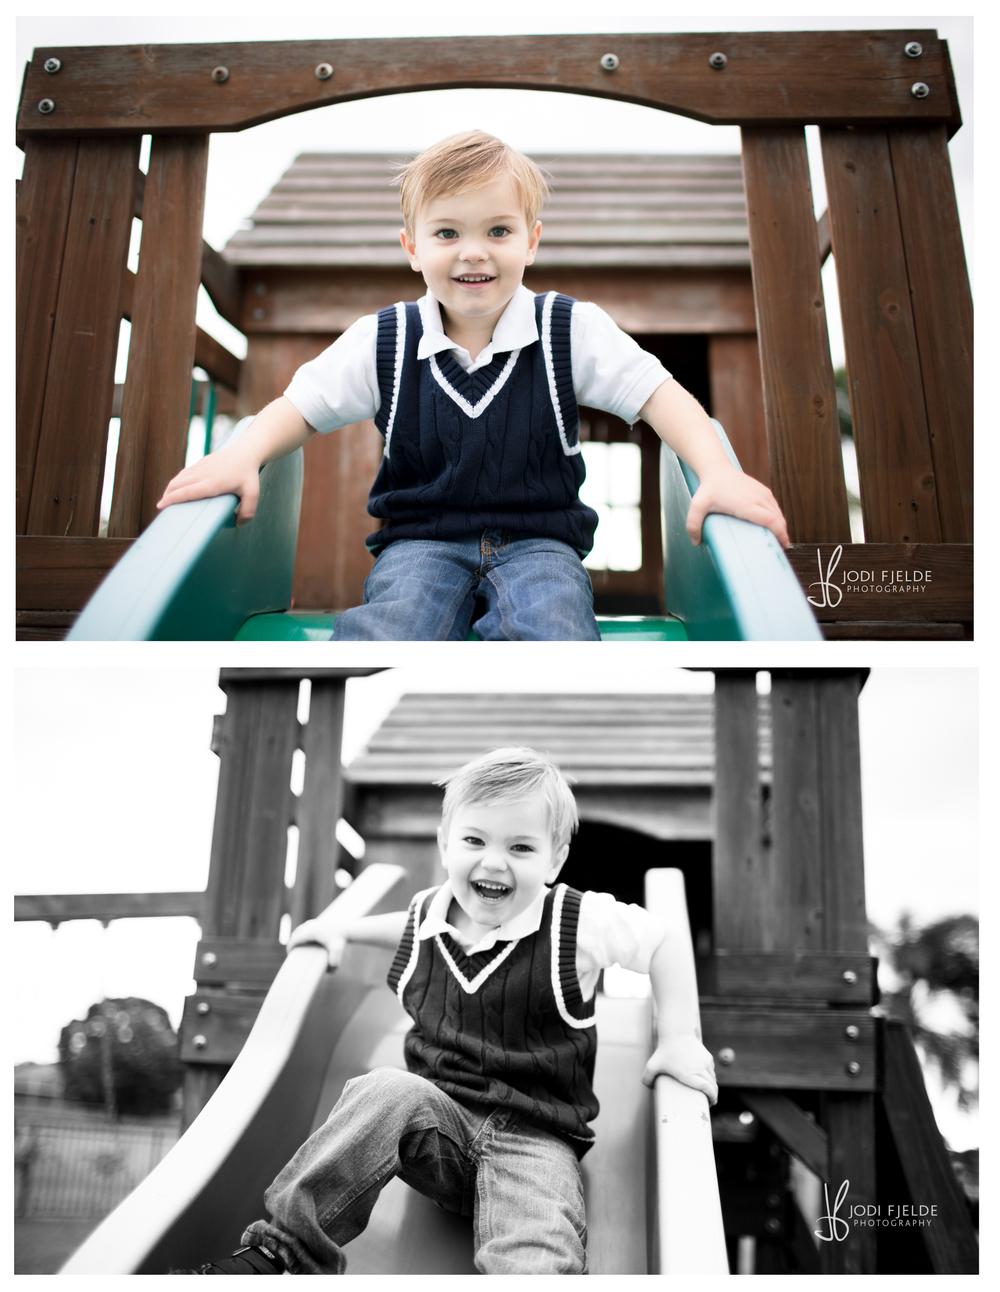 Boynton_Beach_Child_Photographer_Brady_Jodi_Fjelde_Photography  3.jpg